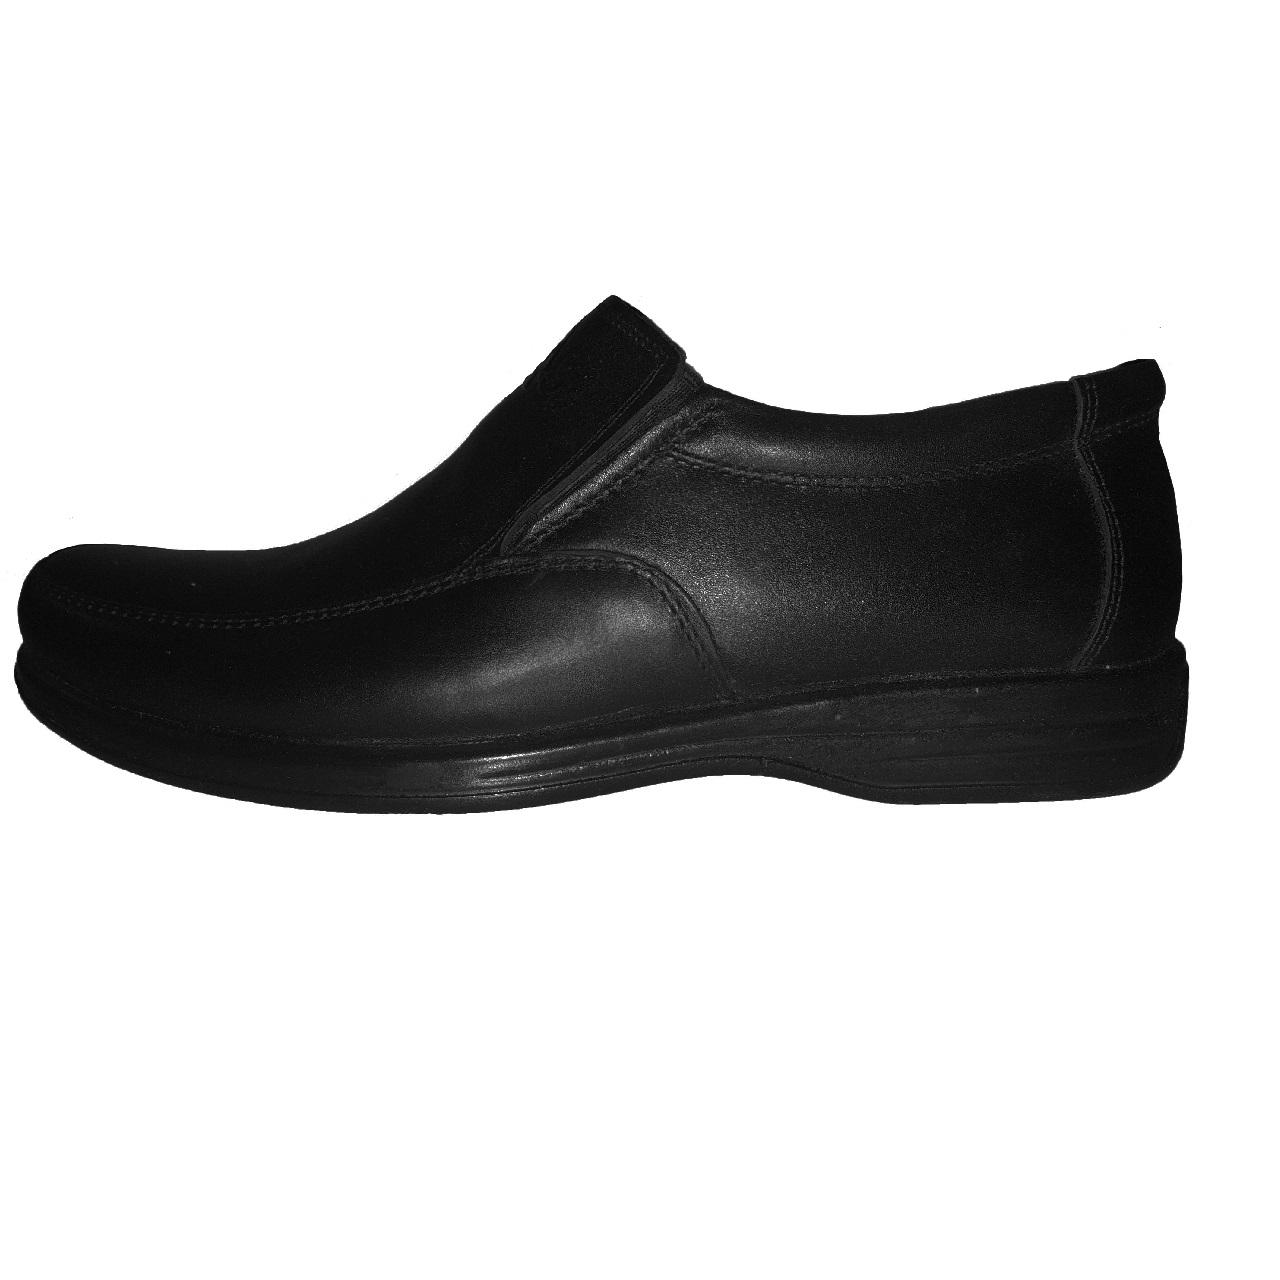 کفش روزمره مردانه نقدی کد 02